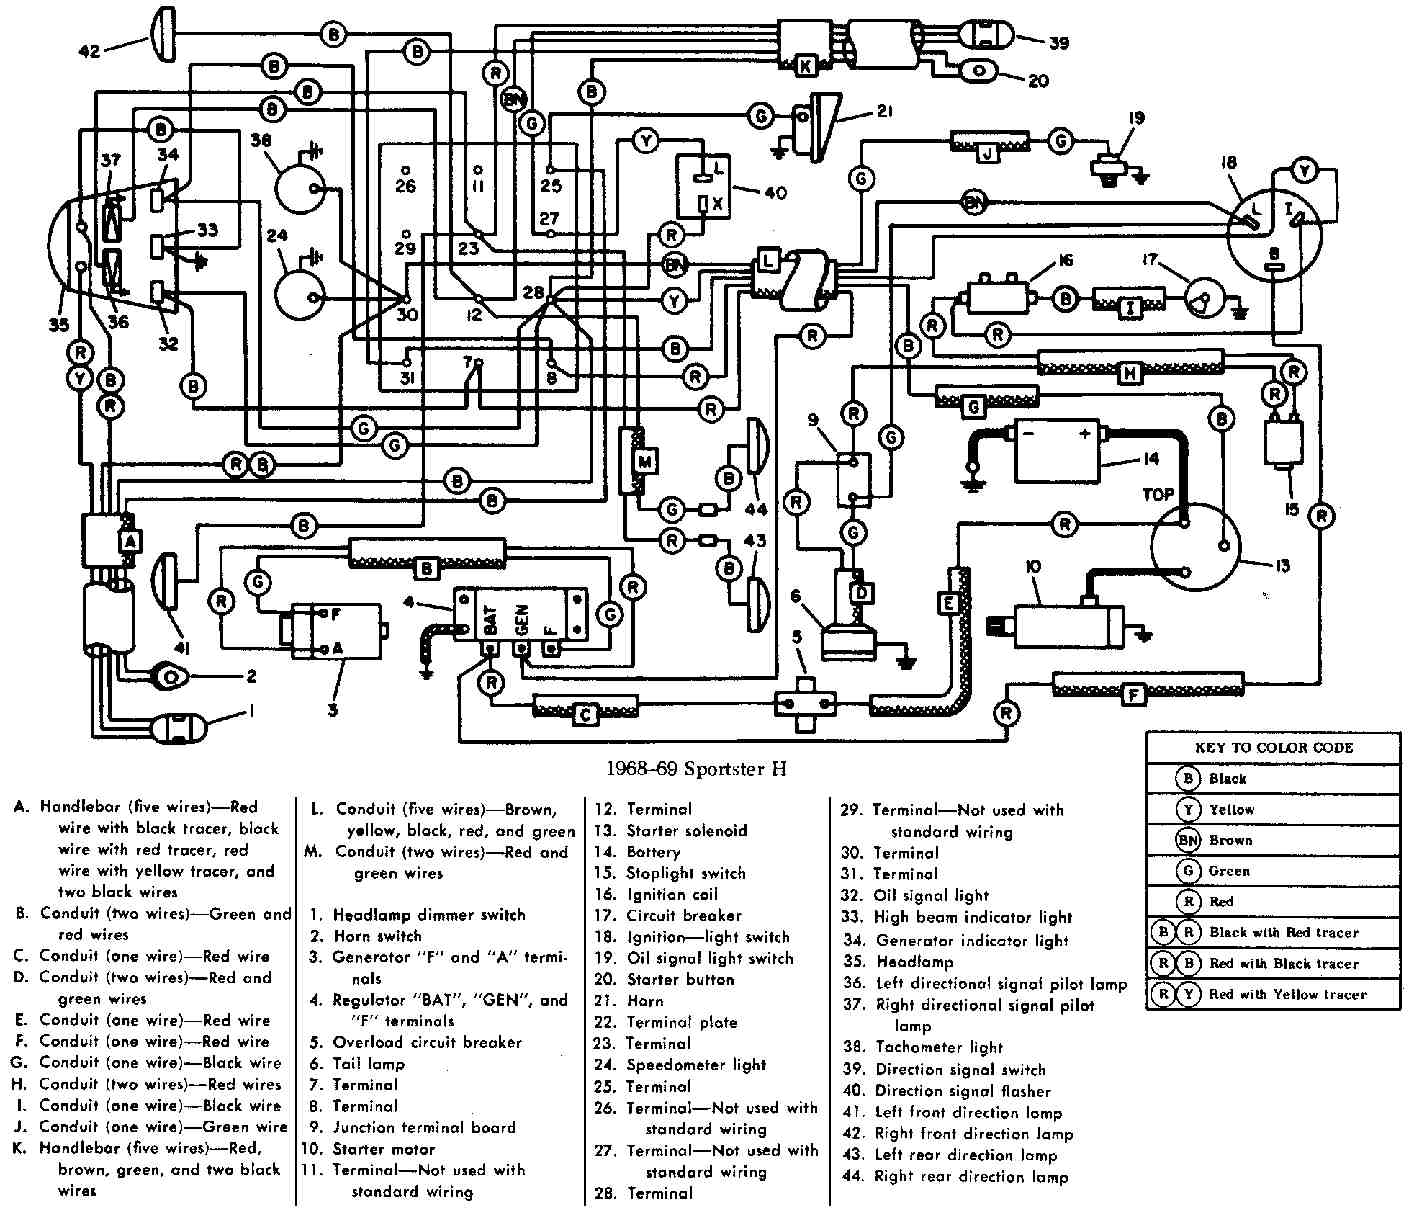 1972 sportster wiring diagram 1977 harley davidson wiring diagram wiring diagram schematics  1977 harley davidson wiring diagram